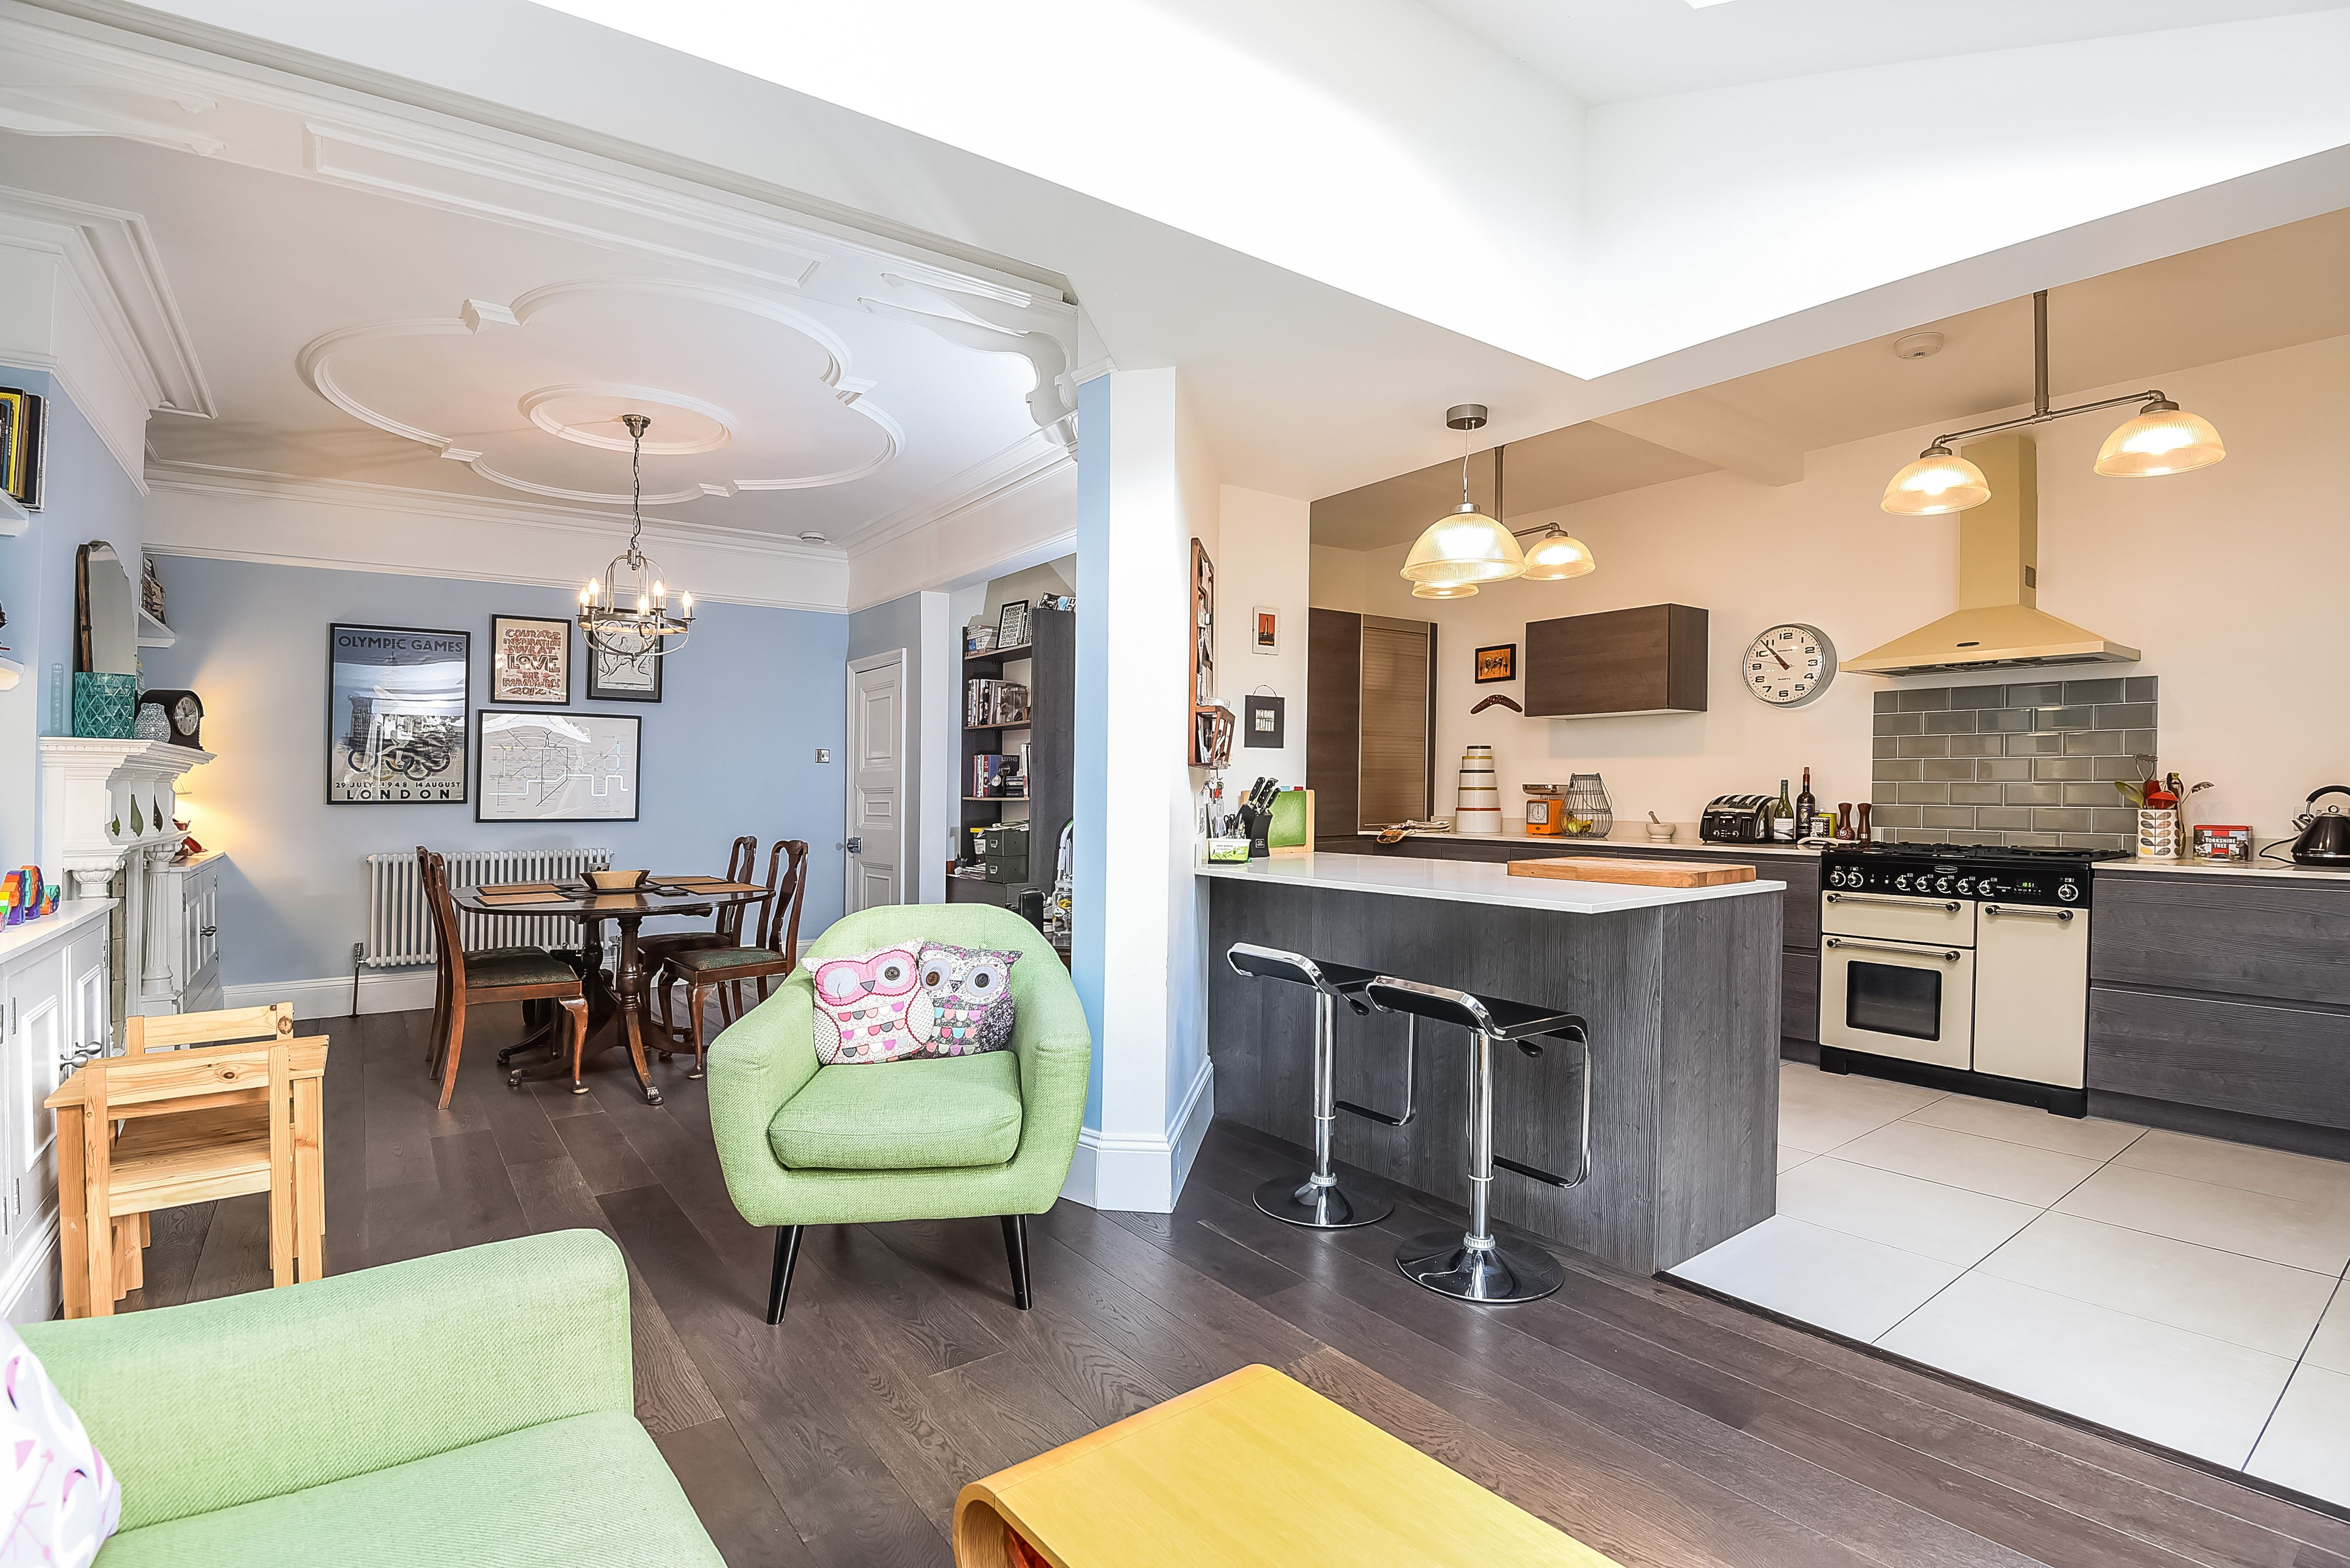 Green armchair, open plan kitchen/living/dining